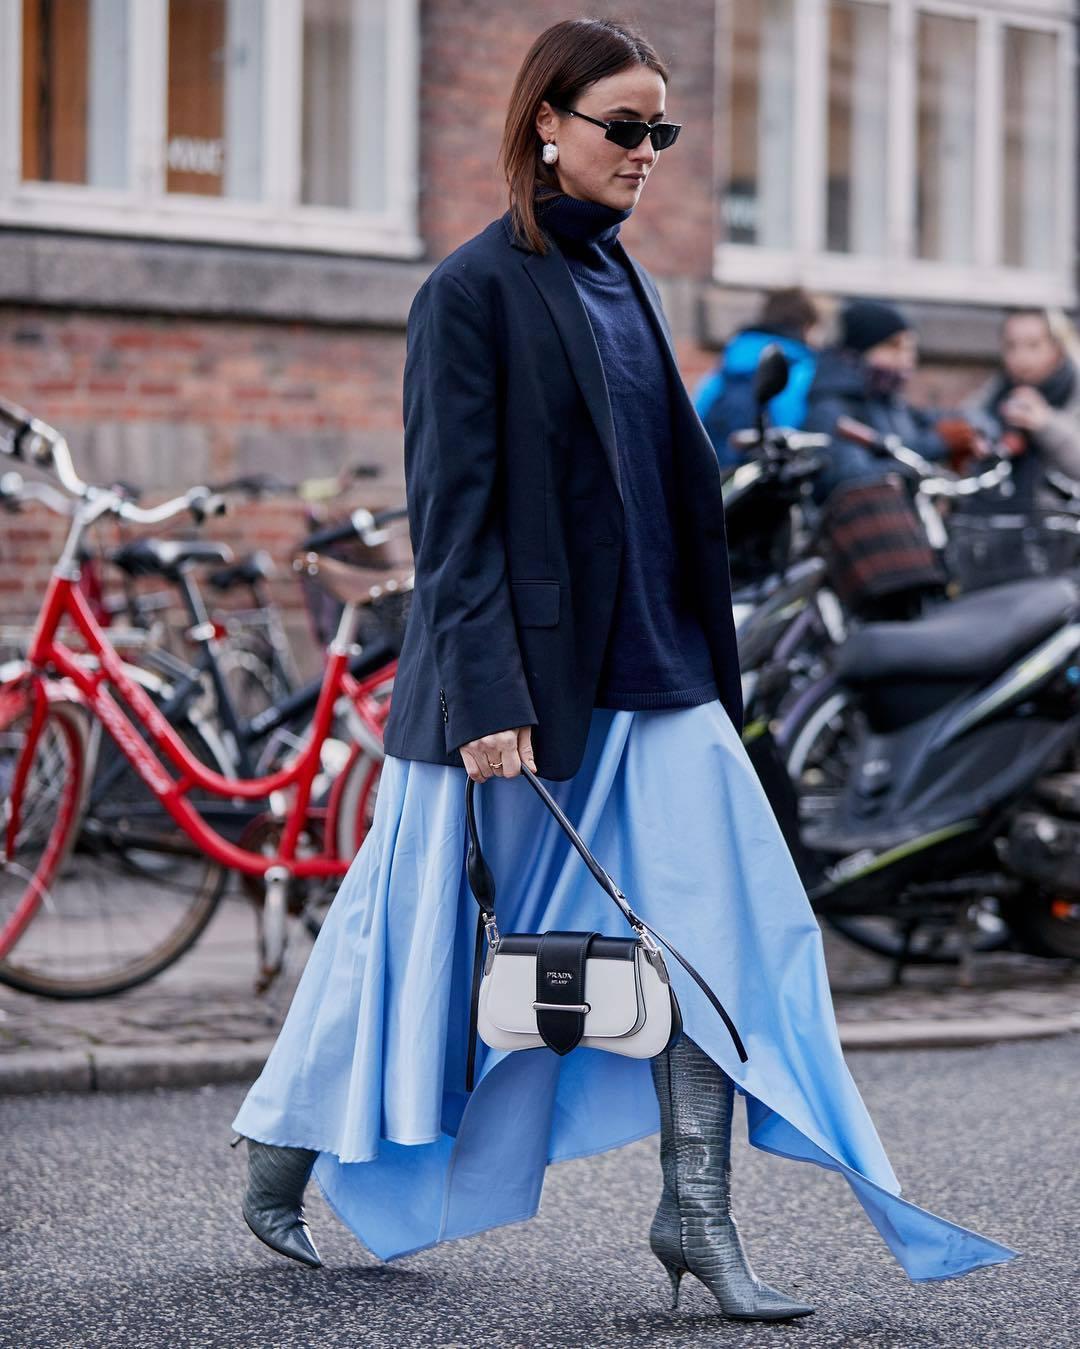 bag white bag leather bag shoulder bag prada bag knee high boots grey boots heel boots blue shirt maxi skirt asymmetrical skirt turtleneck sweater navy blazer